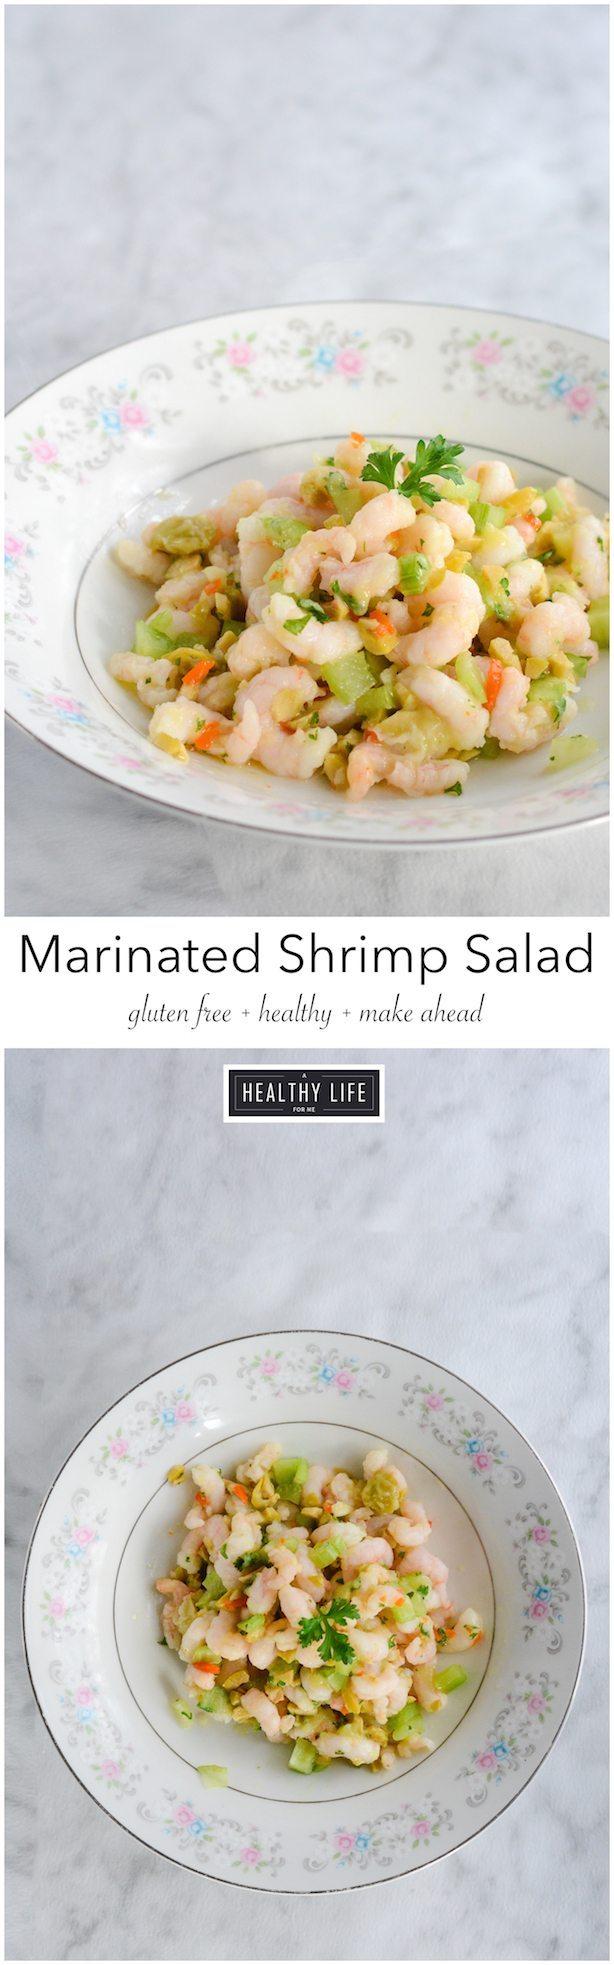 Marinated Shrimp Salad is easy make ahead healthy gluten free and paleo recipe | ahealthylifeforme.com